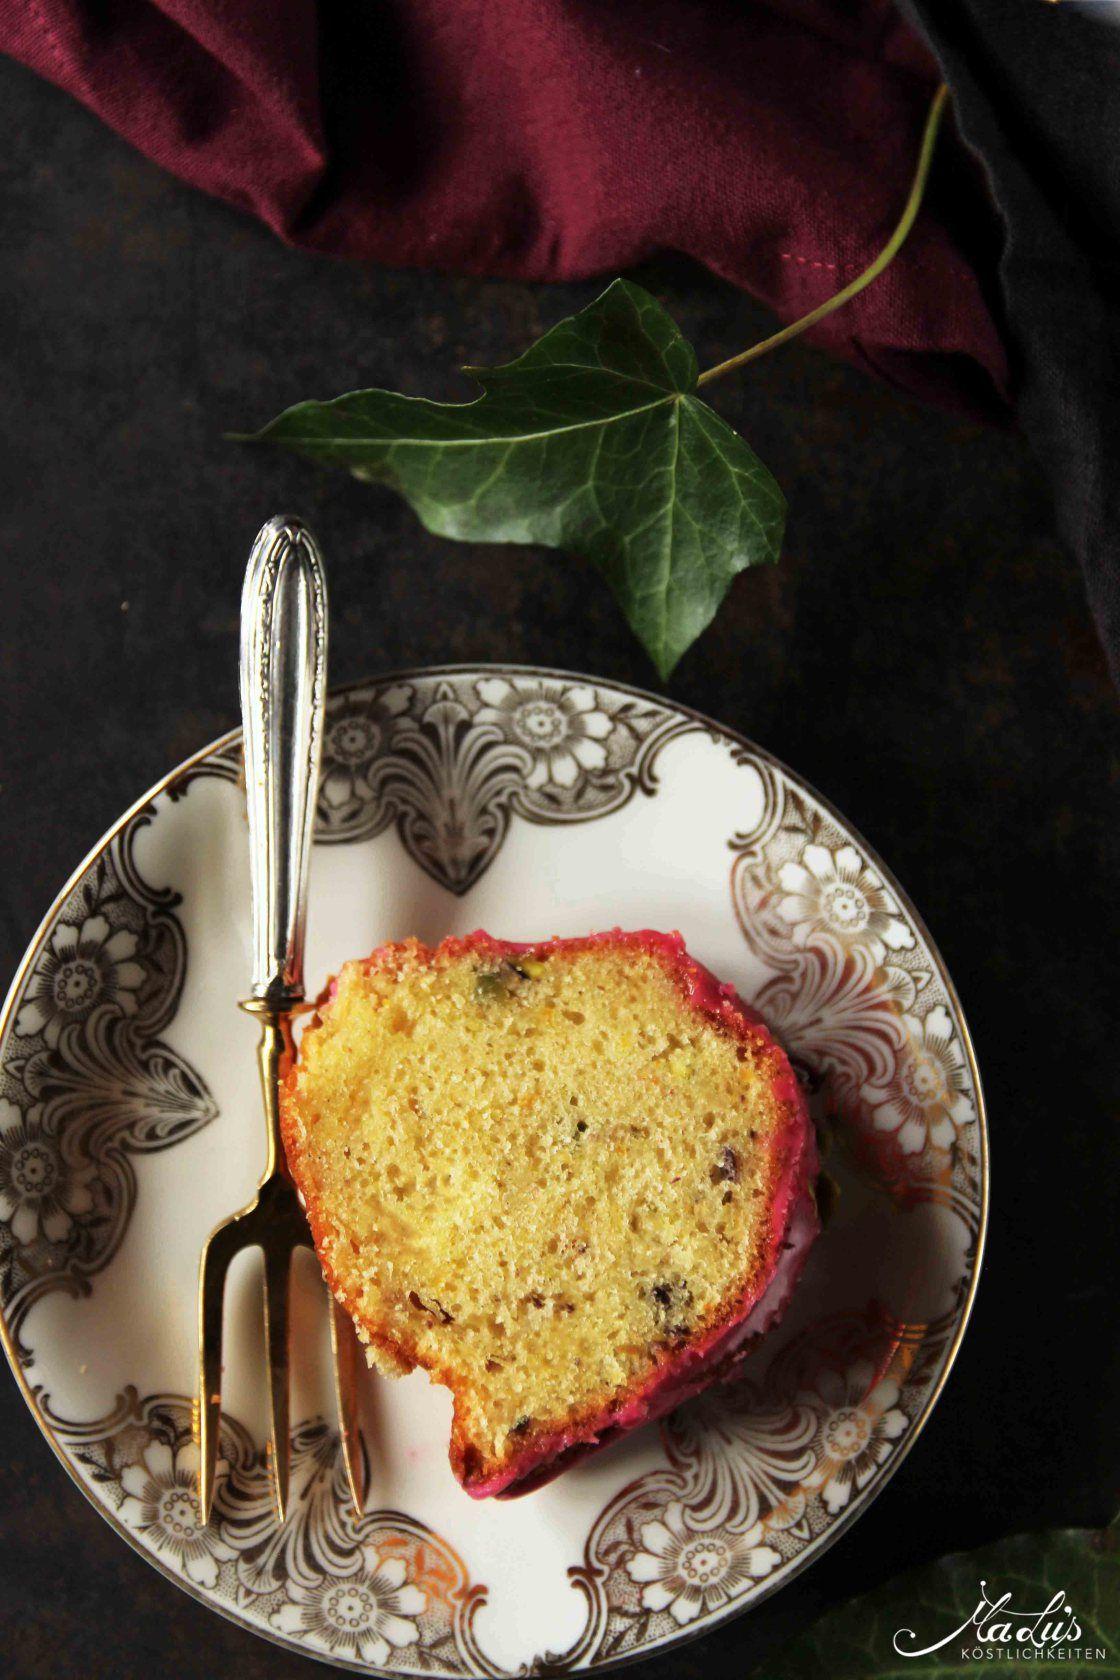 Duftiger Gugelhupf mit Rose & Hibiskus  Gugelhupf, Kuchen und